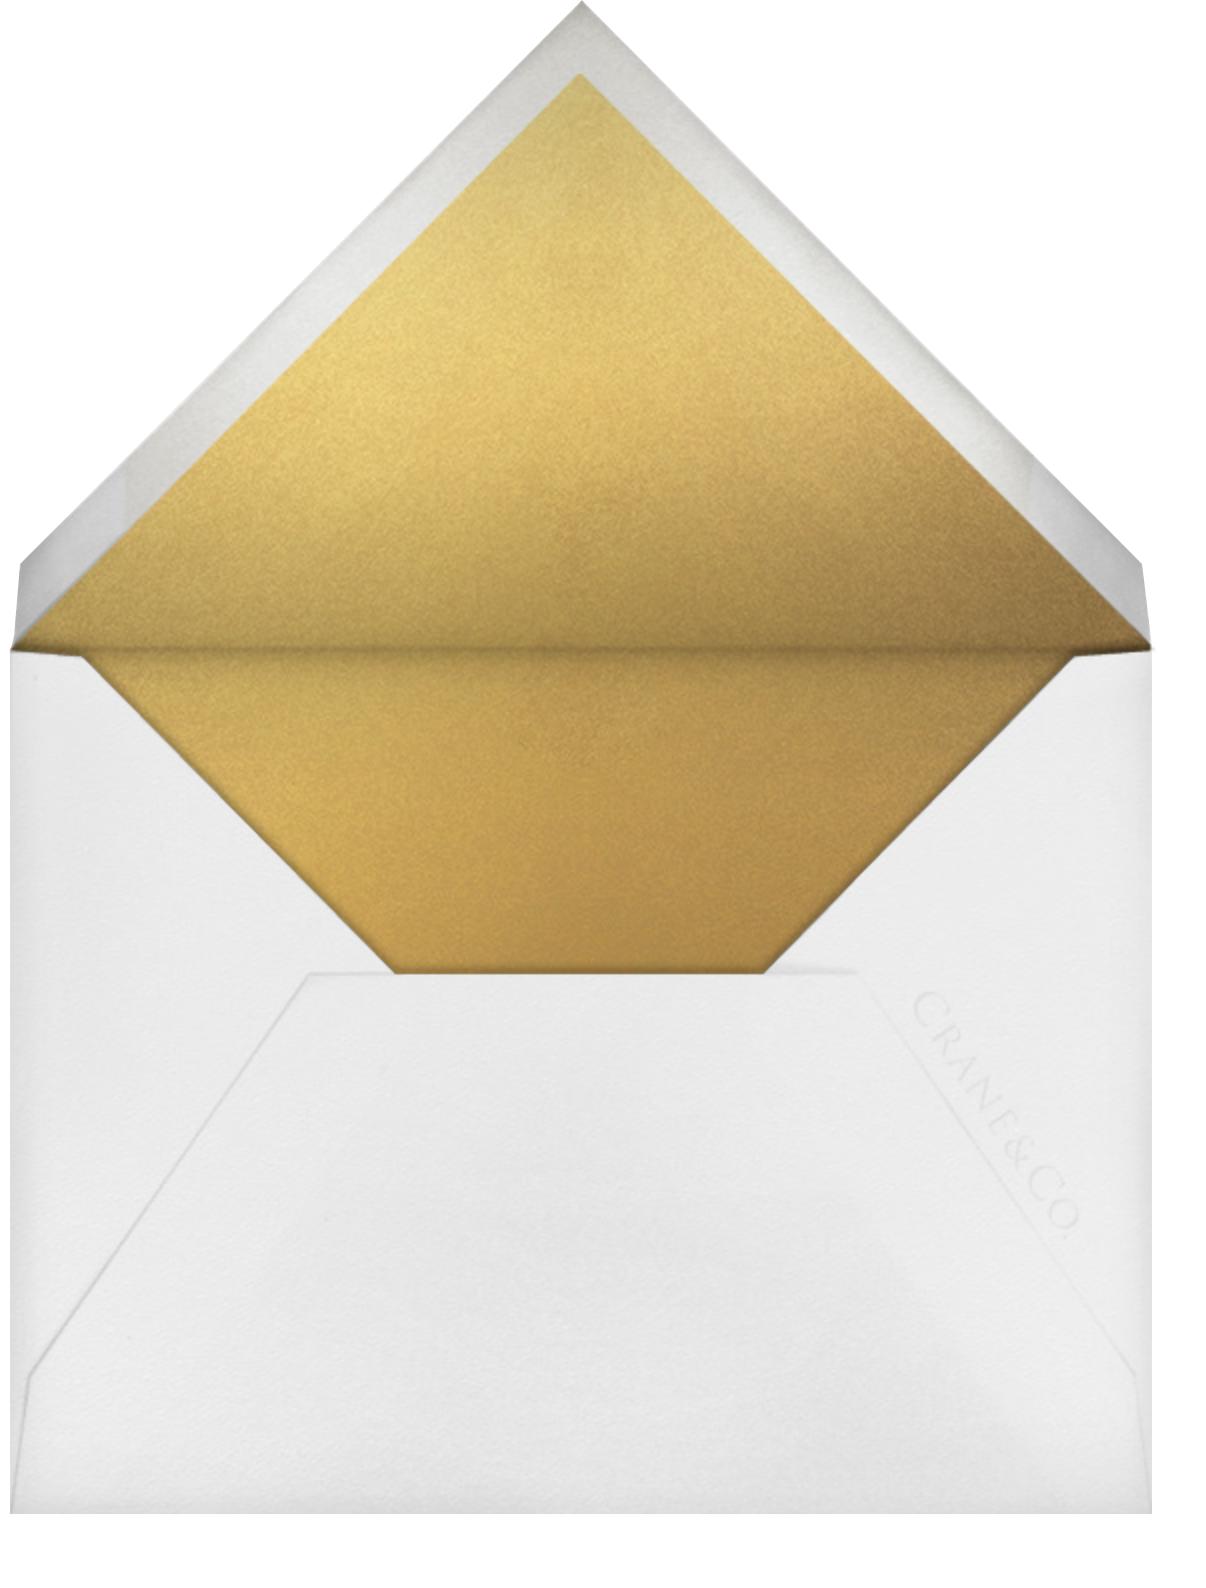 Revel - Gold - Vera Wang - Adult birthday - envelope back